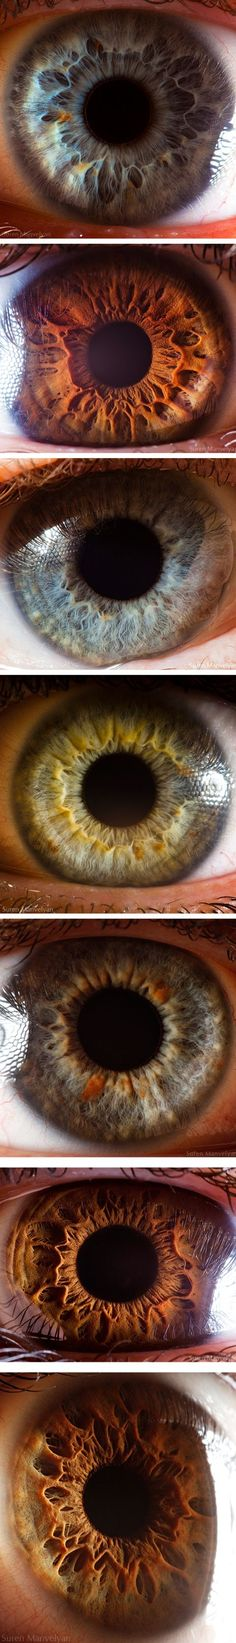 Draw Human Eyes Close-up. Close up photography of the human eye. Close Up Photography, Photography Tips, Human Photography, Window Photography, Levitation Photography, Exposure Photography, Abstract Photography, Beach Photography, Iphone Photography